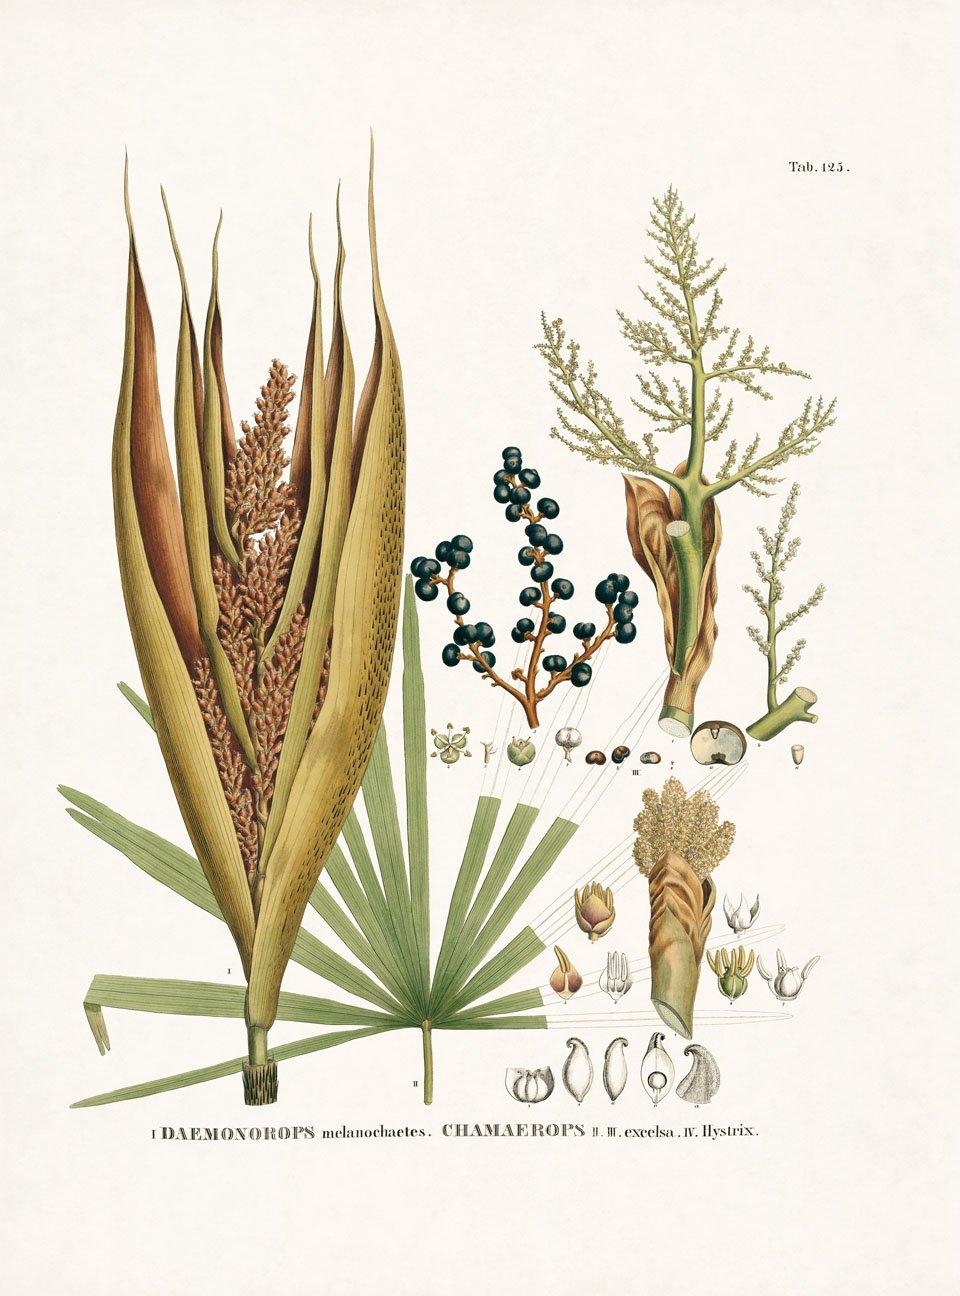 CALAMOIDEAE (Rotangpalmenähnliche) Fig. 1 Daemonorops melanocha